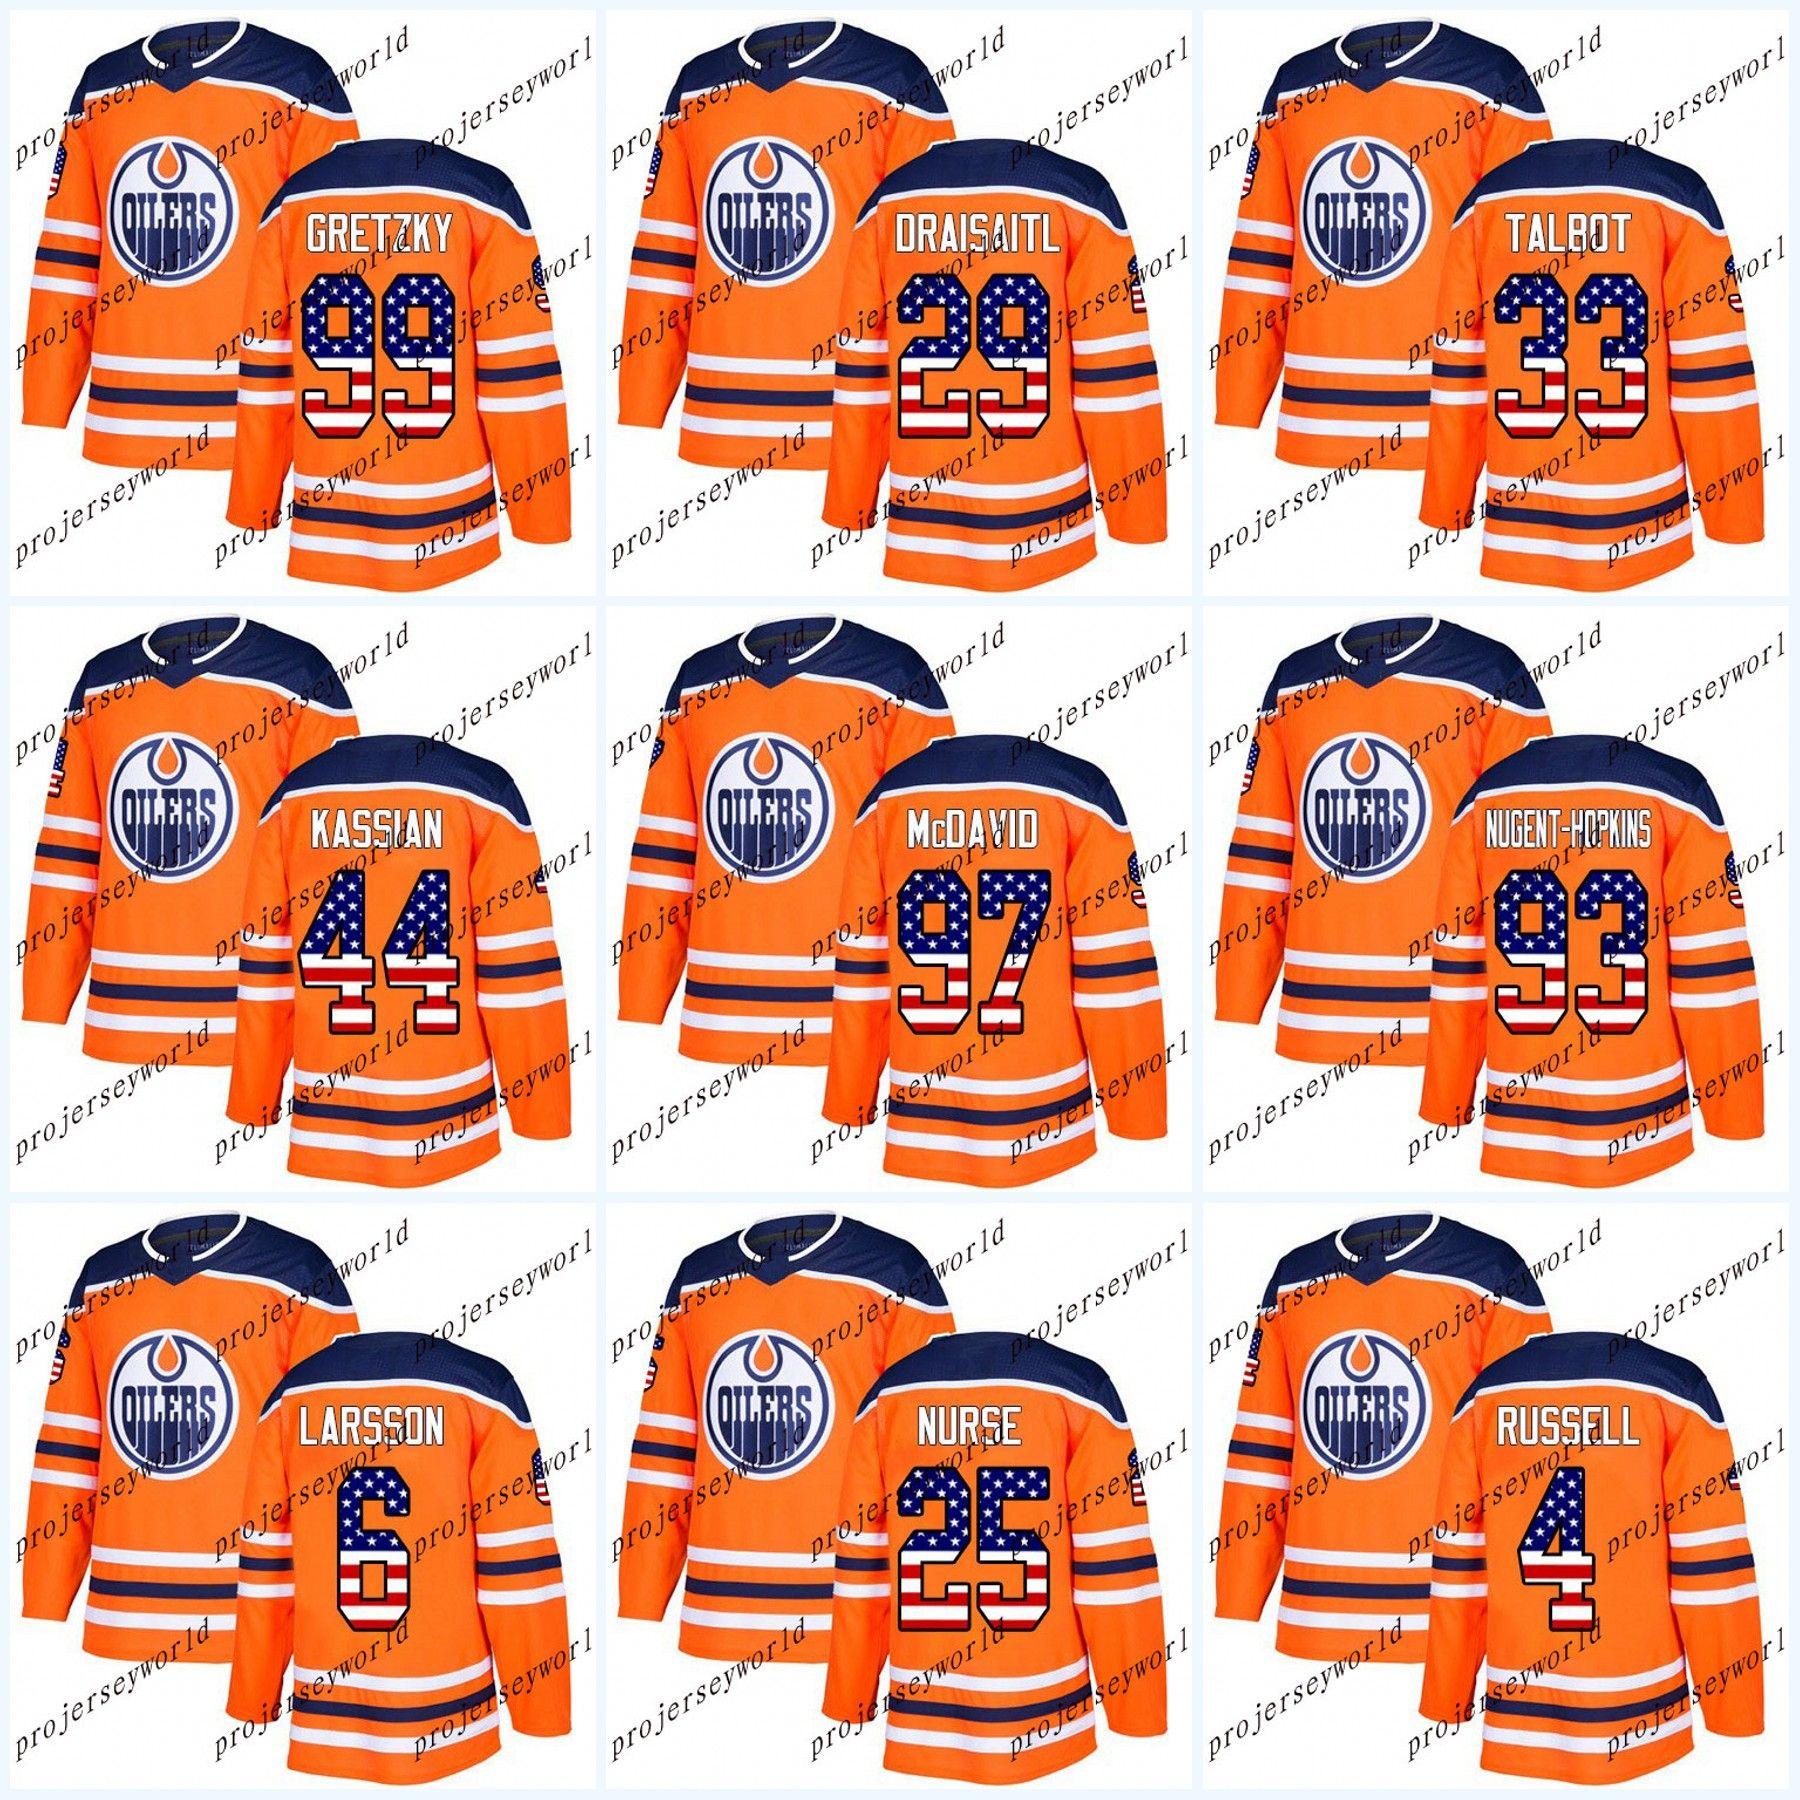 brand new 1c4a9 d59dd USA Flag Stitched Edmonton Oilers Zack Kassian Connor McDavid Wayne Gretzky  Leon Draisaitl Cam Talbot Ryan Nugent-Hopkins Ice Hockey Jersey